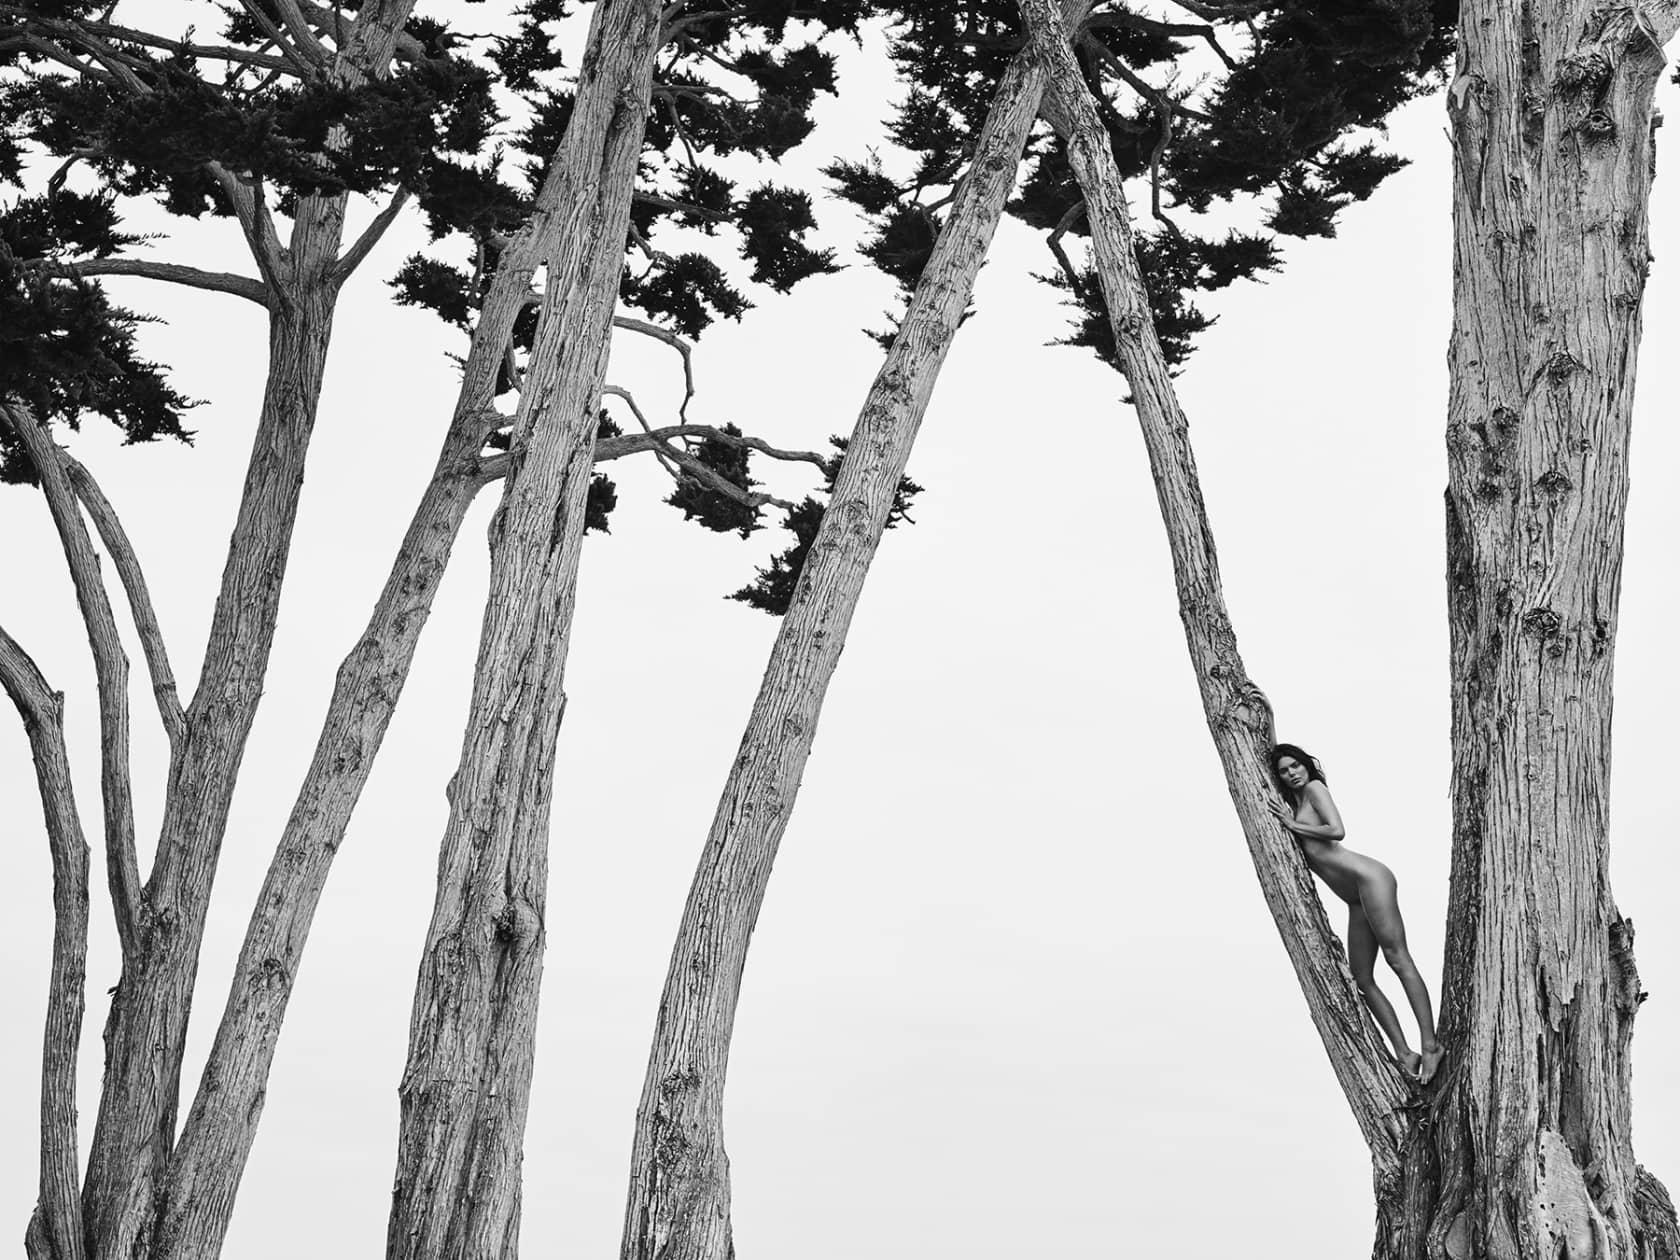 Russell James, Kendall in Treetops Santa Barbara 2018, 2018